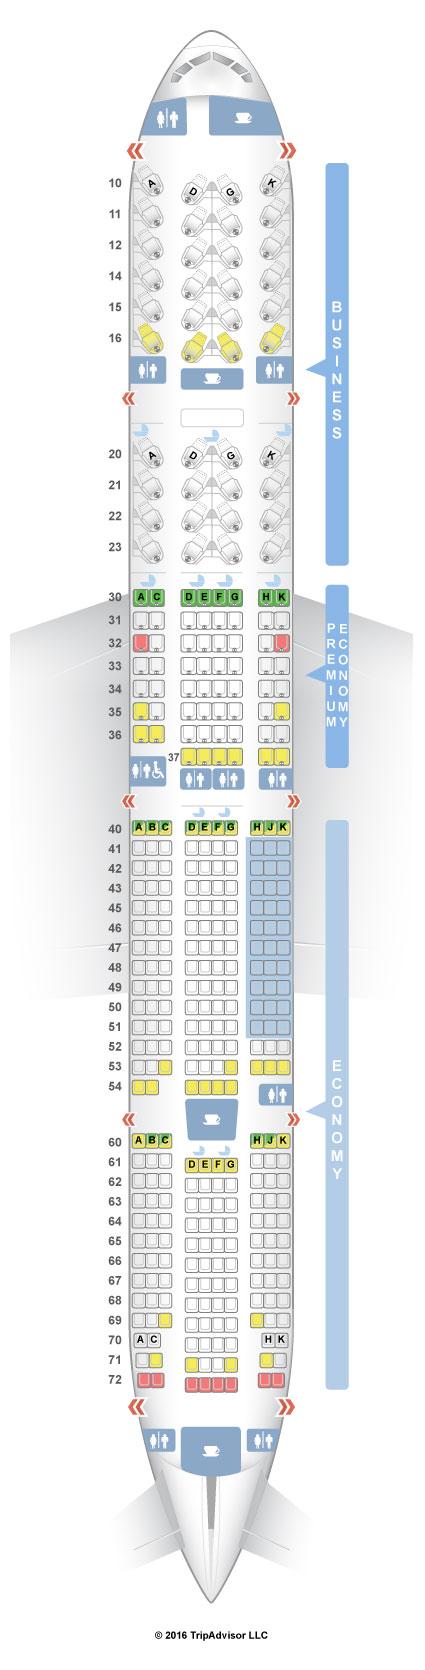 seatguru seat map china airlines boeing 777 300er 77w. Black Bedroom Furniture Sets. Home Design Ideas